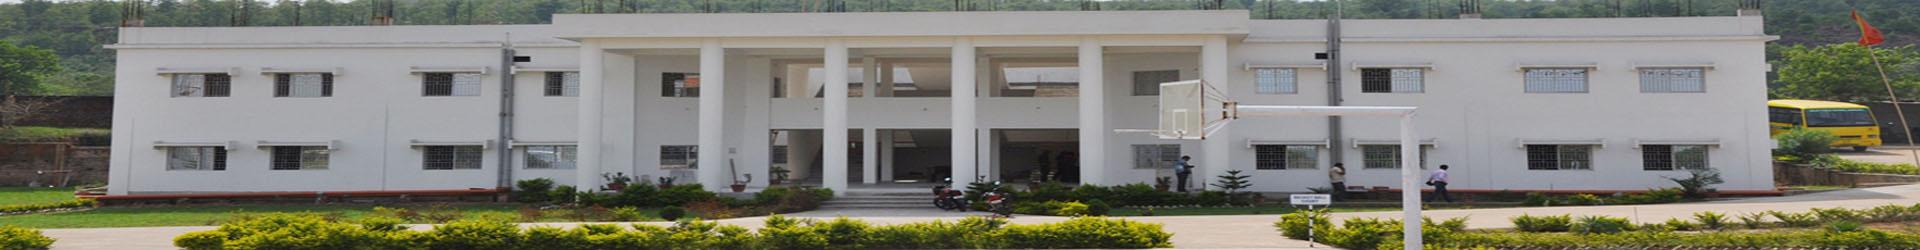 Radha Govind School Of Nursing, Ramgarh Image